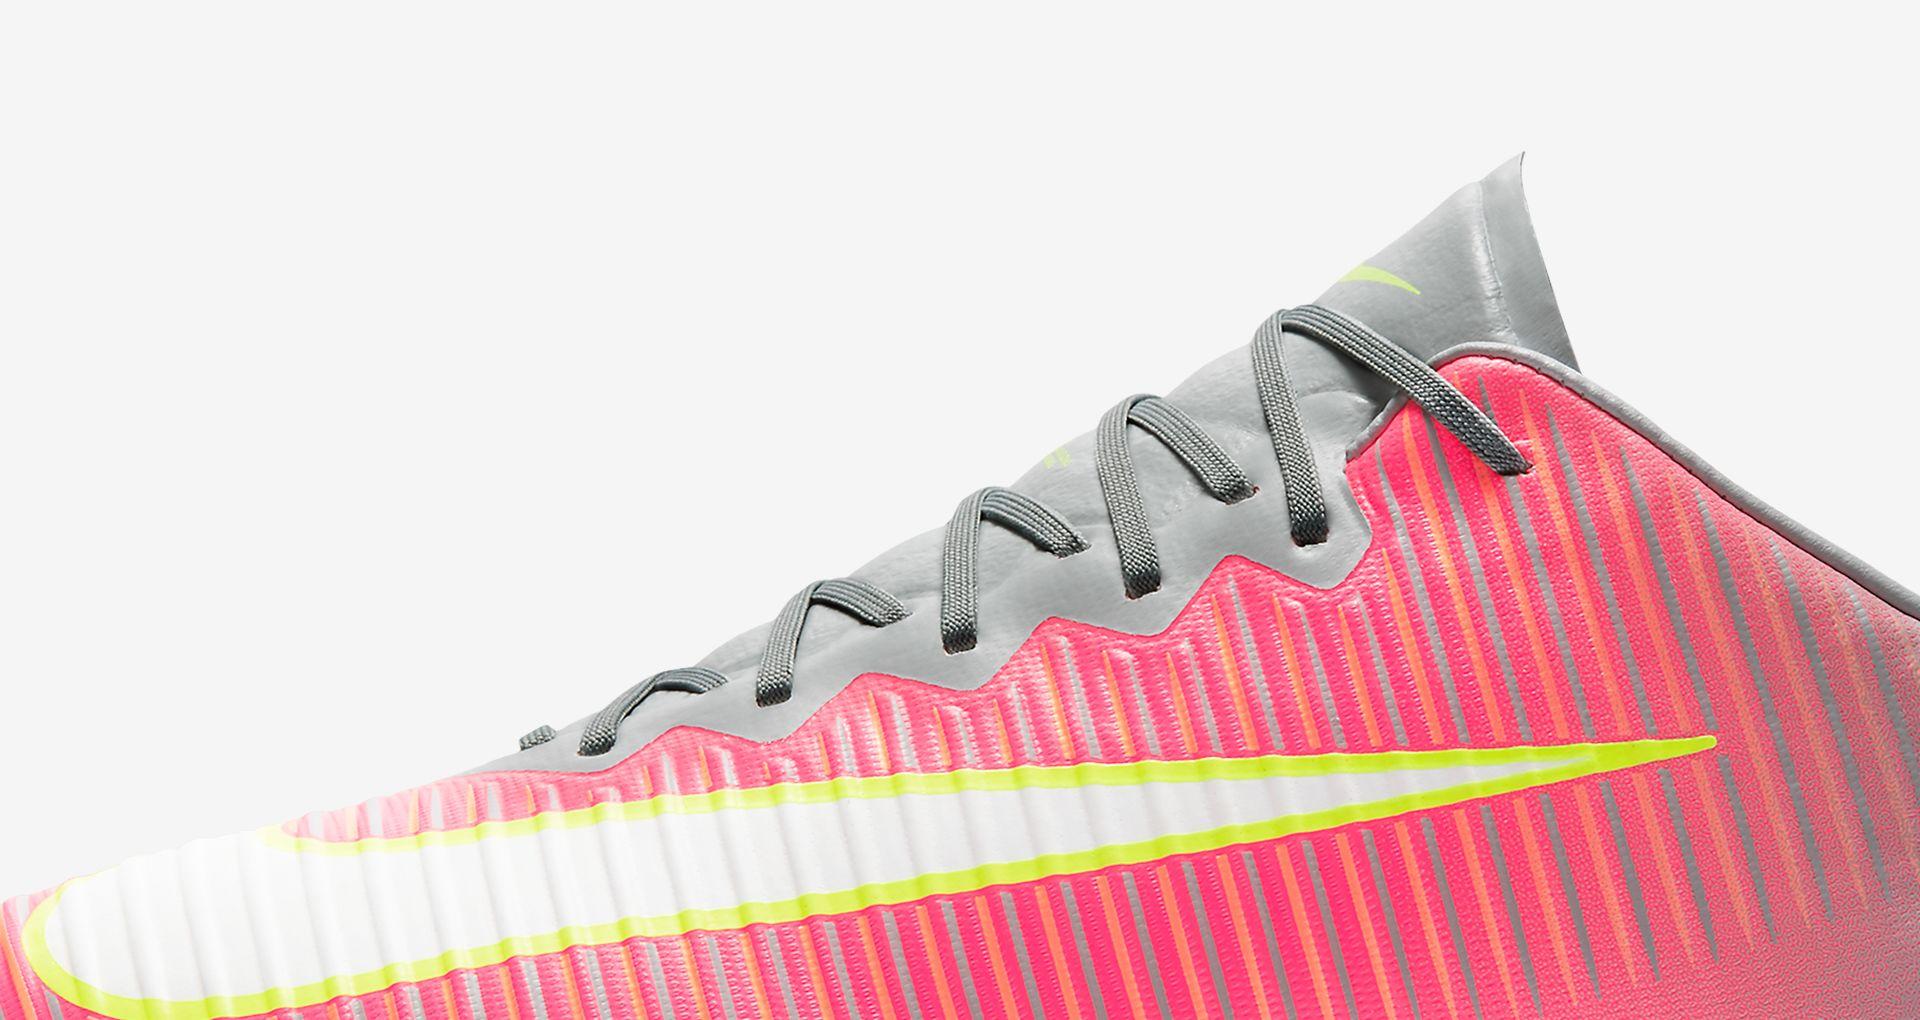 official photos 693dc bd258 Nike Women's Mercurial Vapor 11 'Motion Blur'. Nike.com